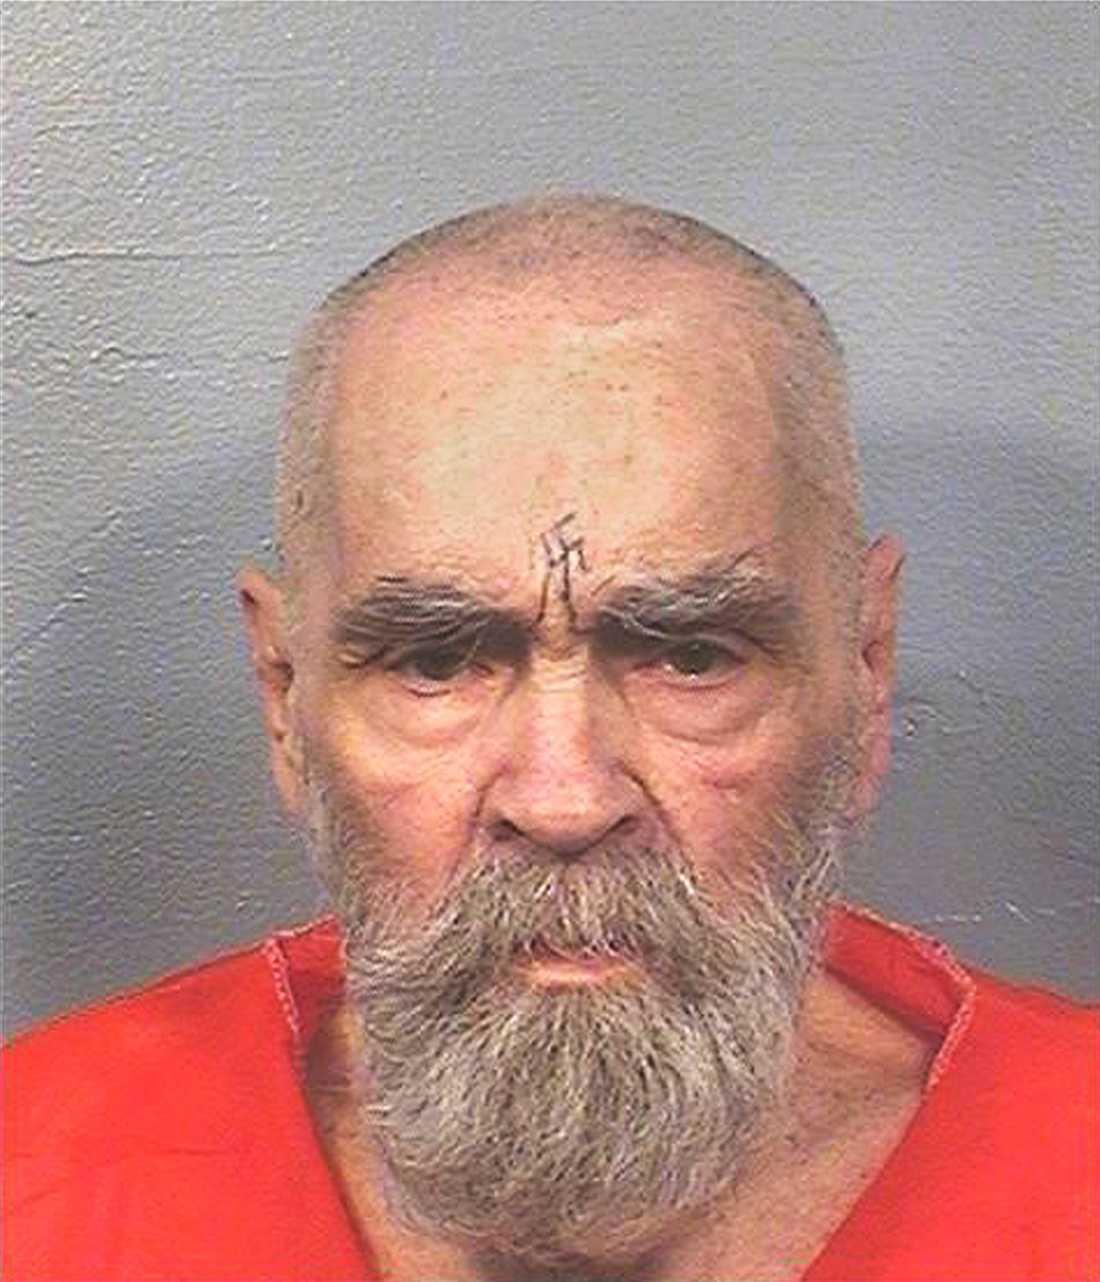 Charles Manson.